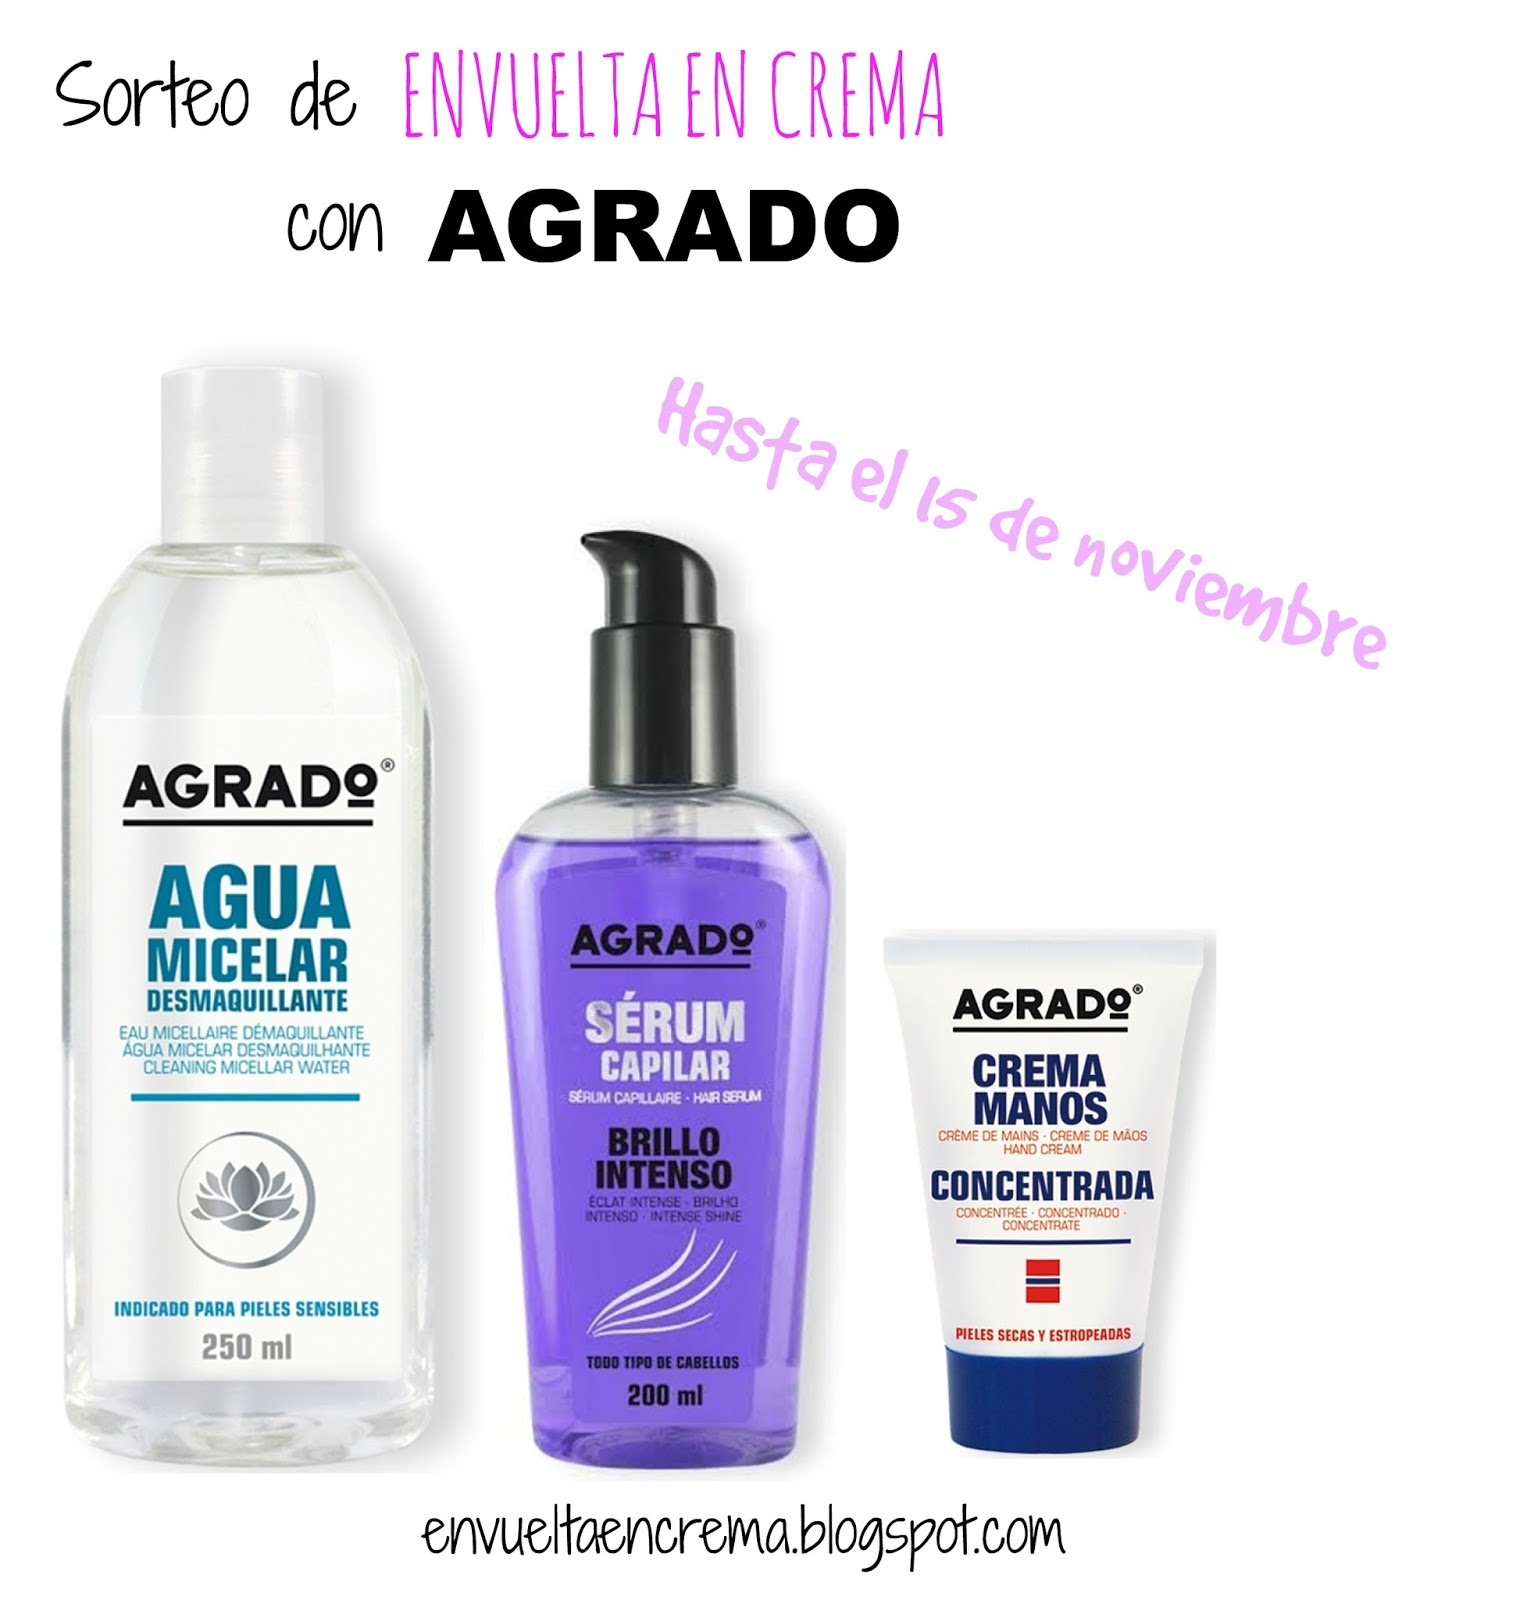 http://envueltaencrema.blogspot.com.es/2015/11/iii-aniversario-de-envuelta-en-crema.html